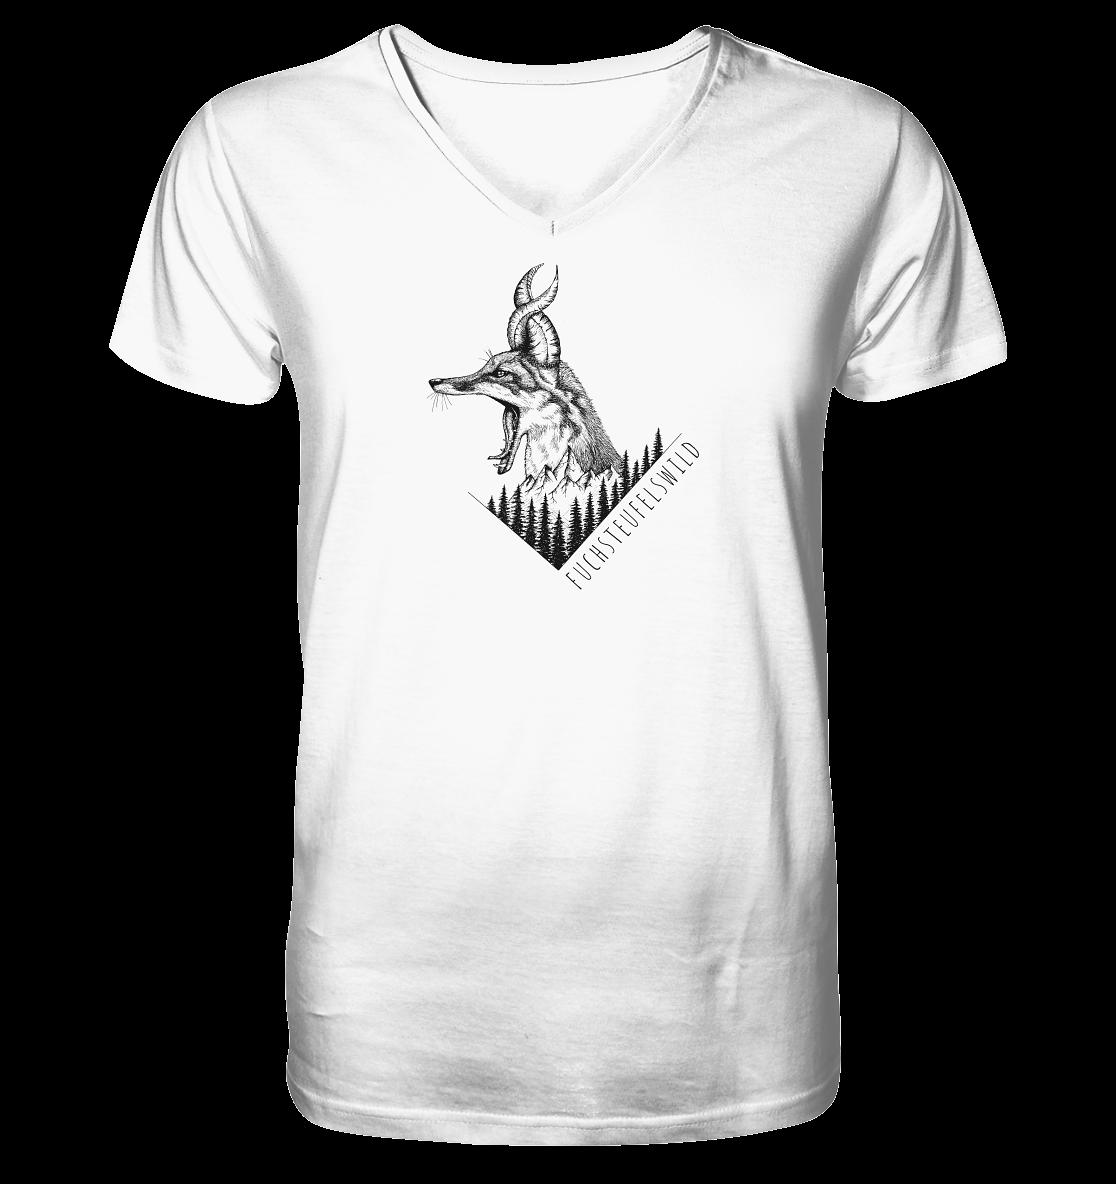 front-mens-organic-v-neck-shirt-f8f8f8-1116x-17.png